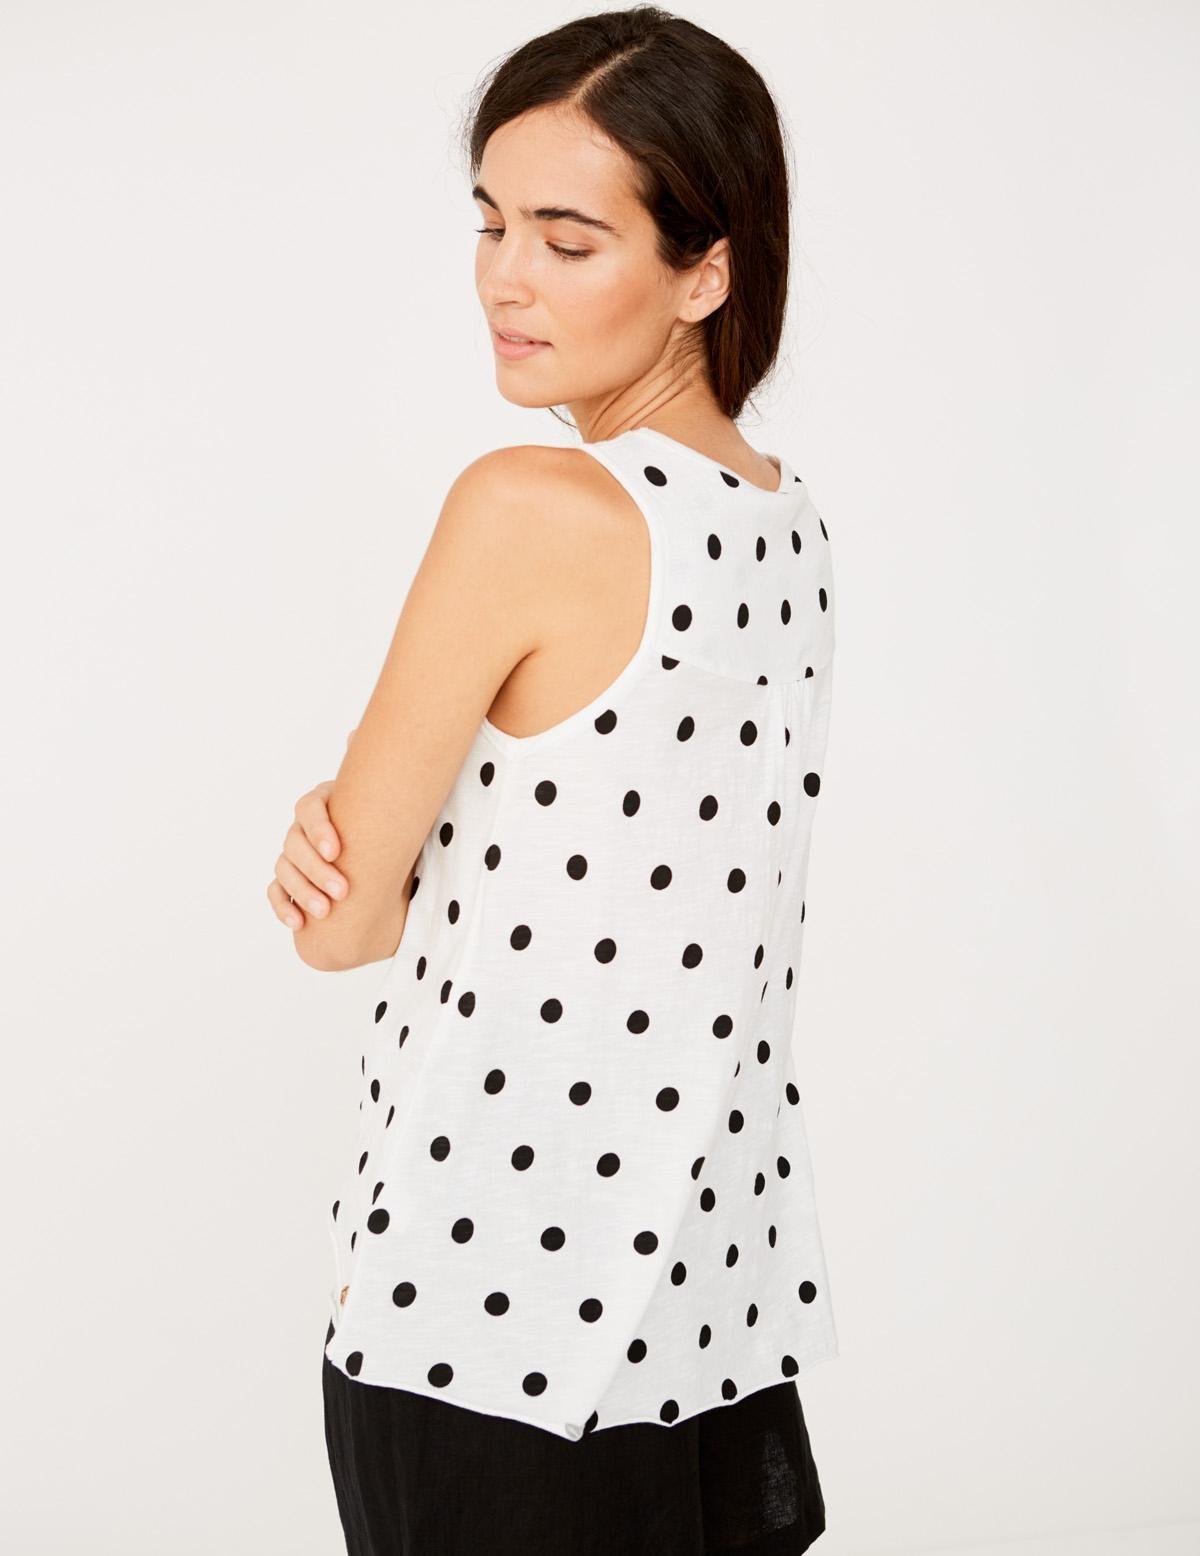 Camiseta topos algodón orgánico - Ítem1